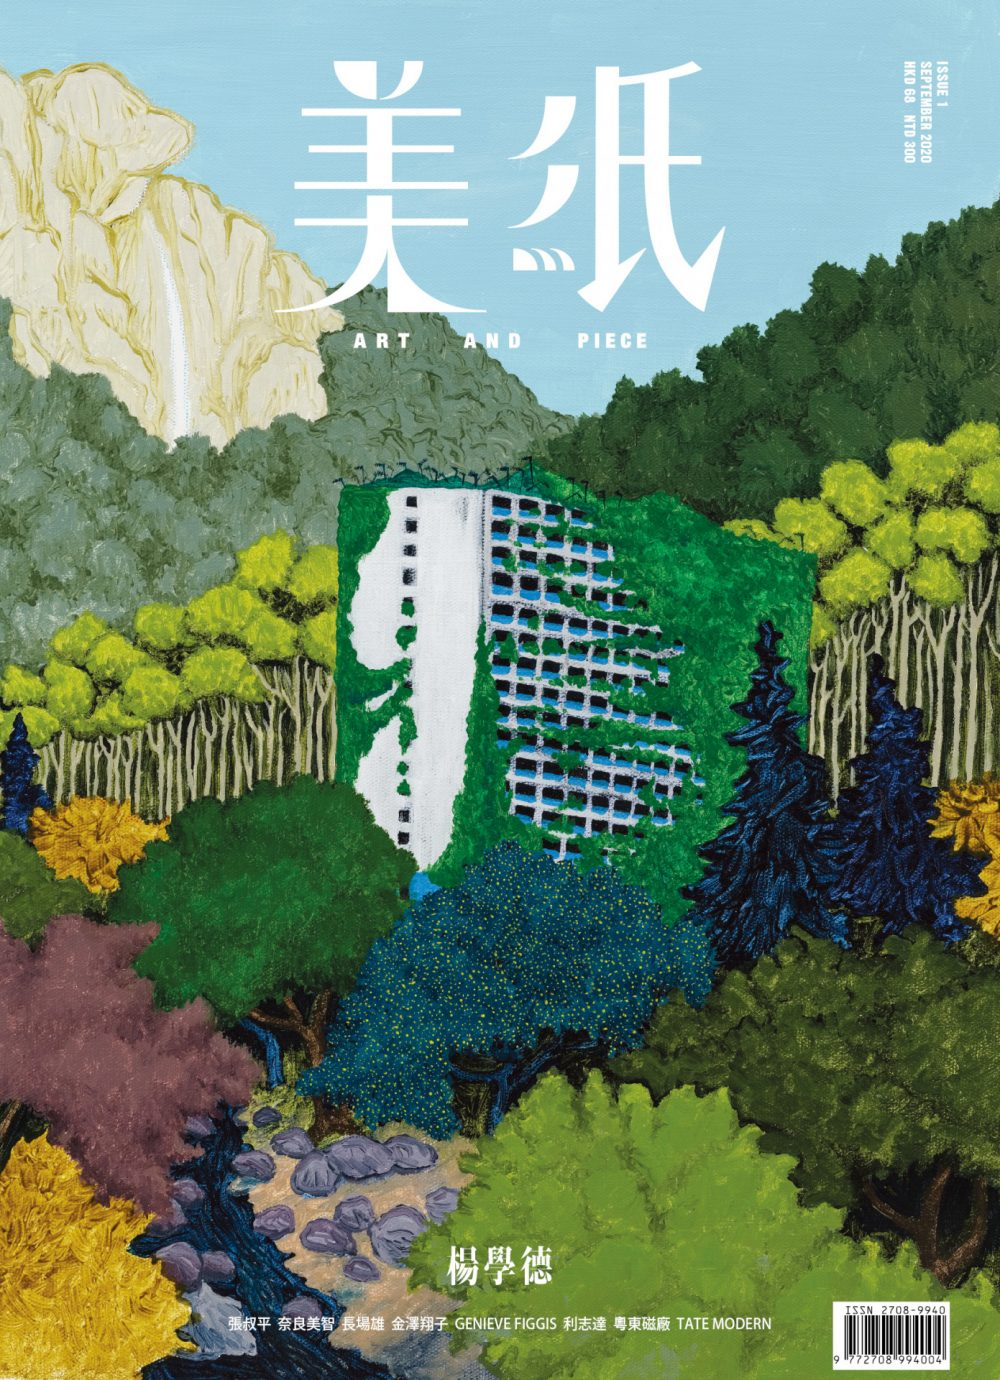 Issue 1 - 楊學德